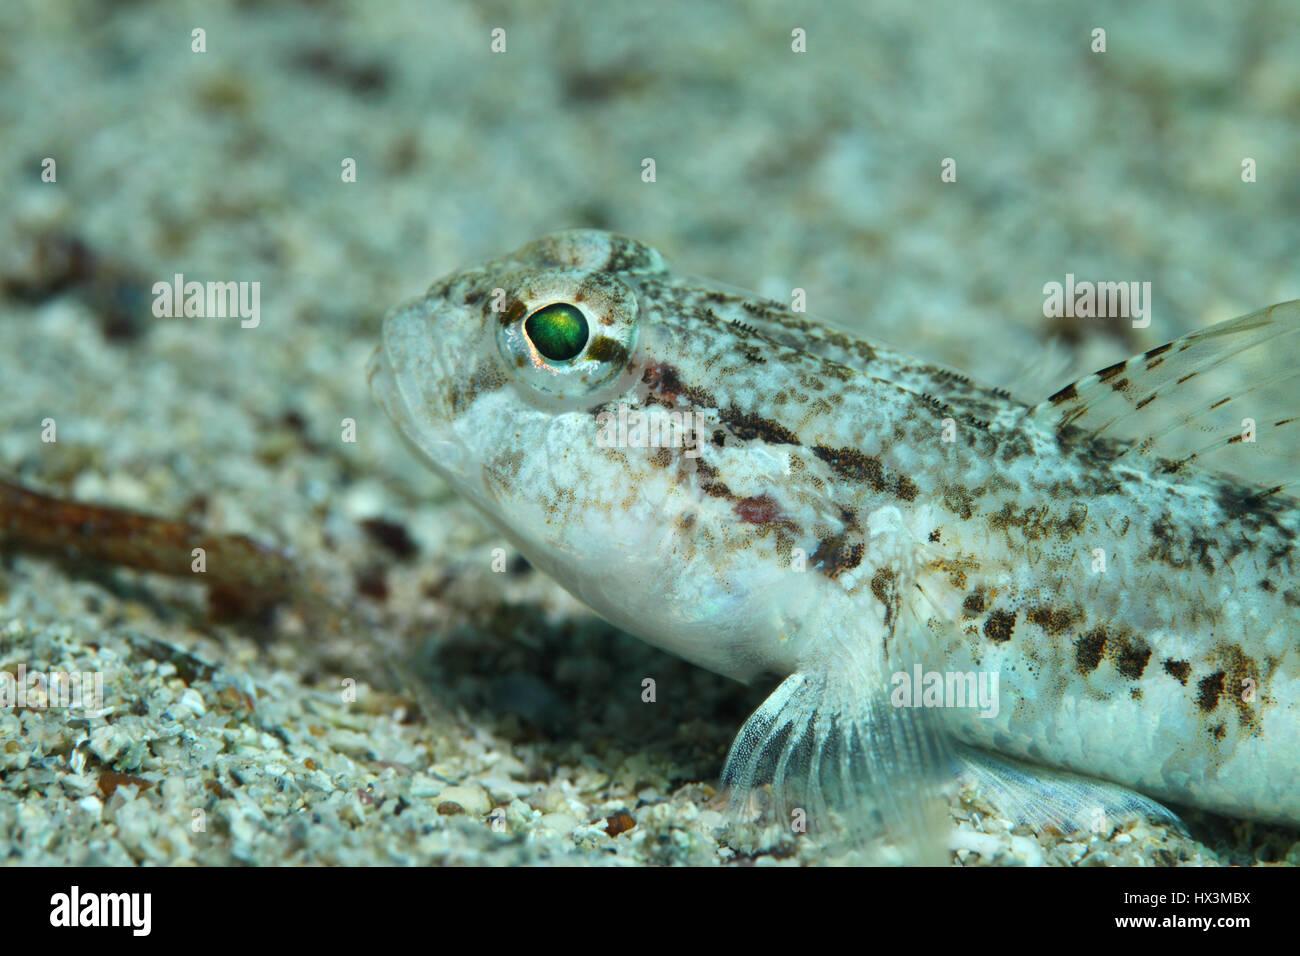 Slender goby fish (Gobius geniporus) underwater in the Mediterranean Sea - Stock Image